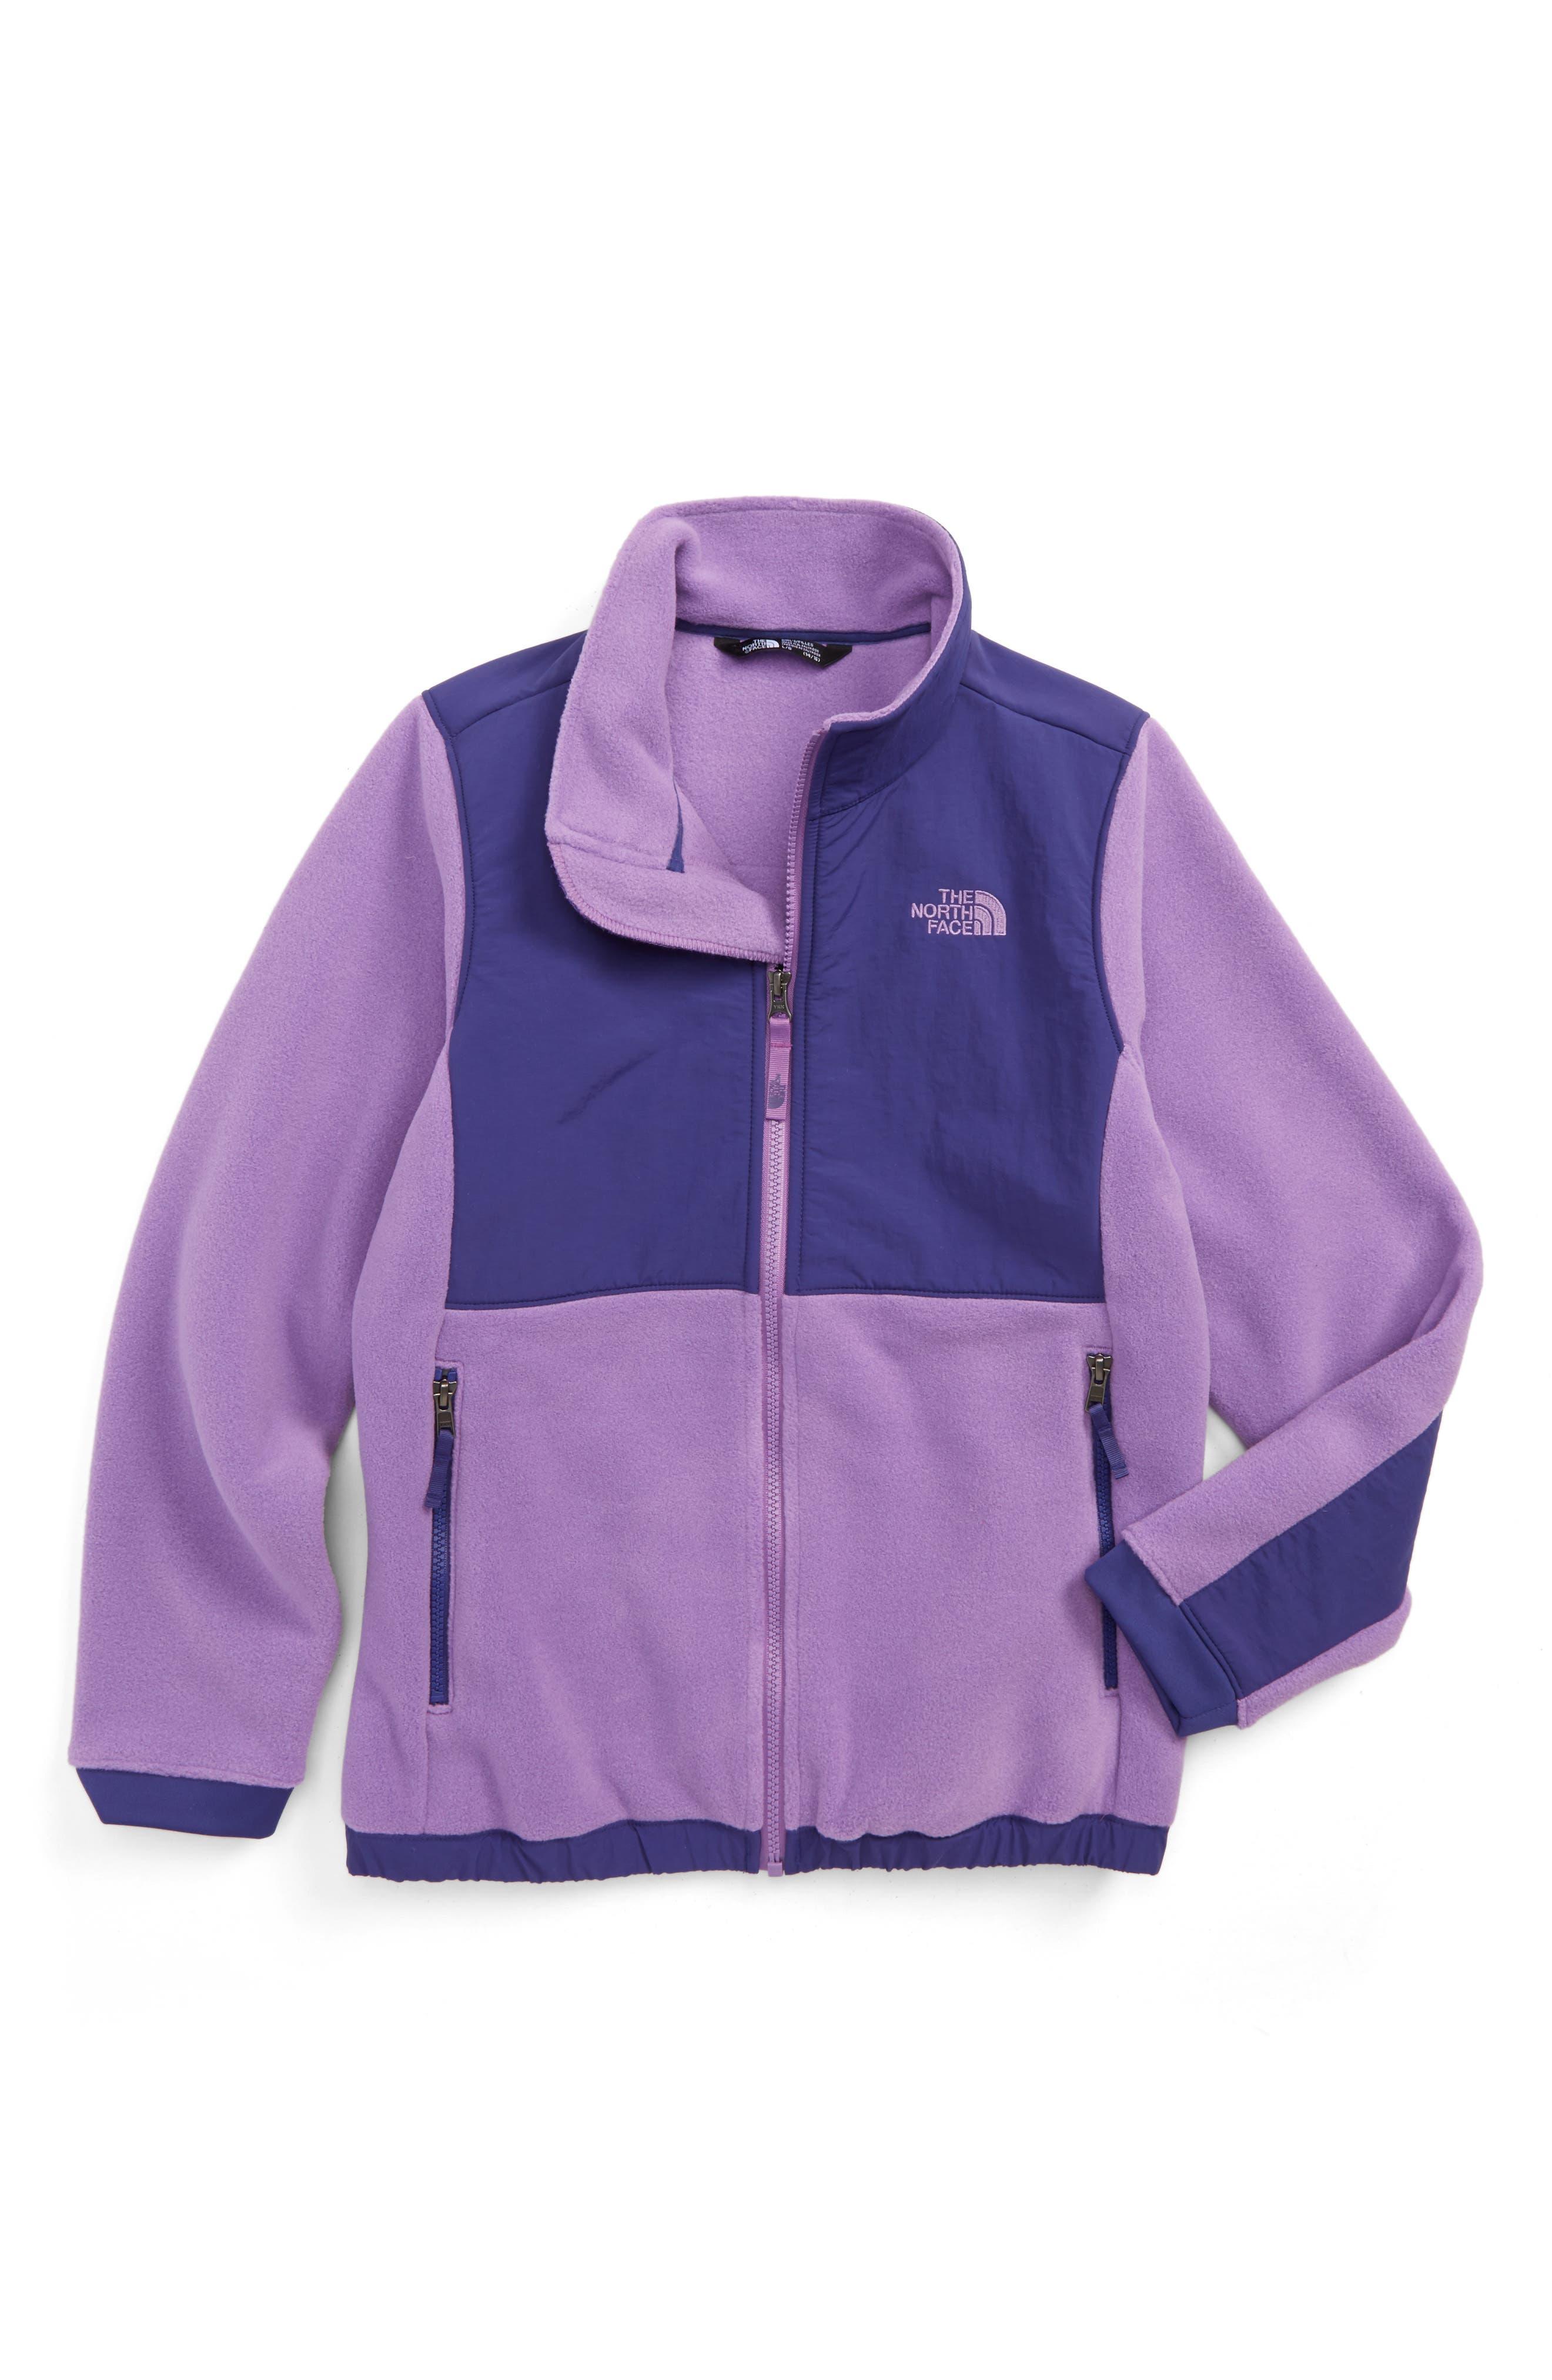 Alternate Image 1 Selected - The North Face Denali Jacket (Little Girls & Big Girls)